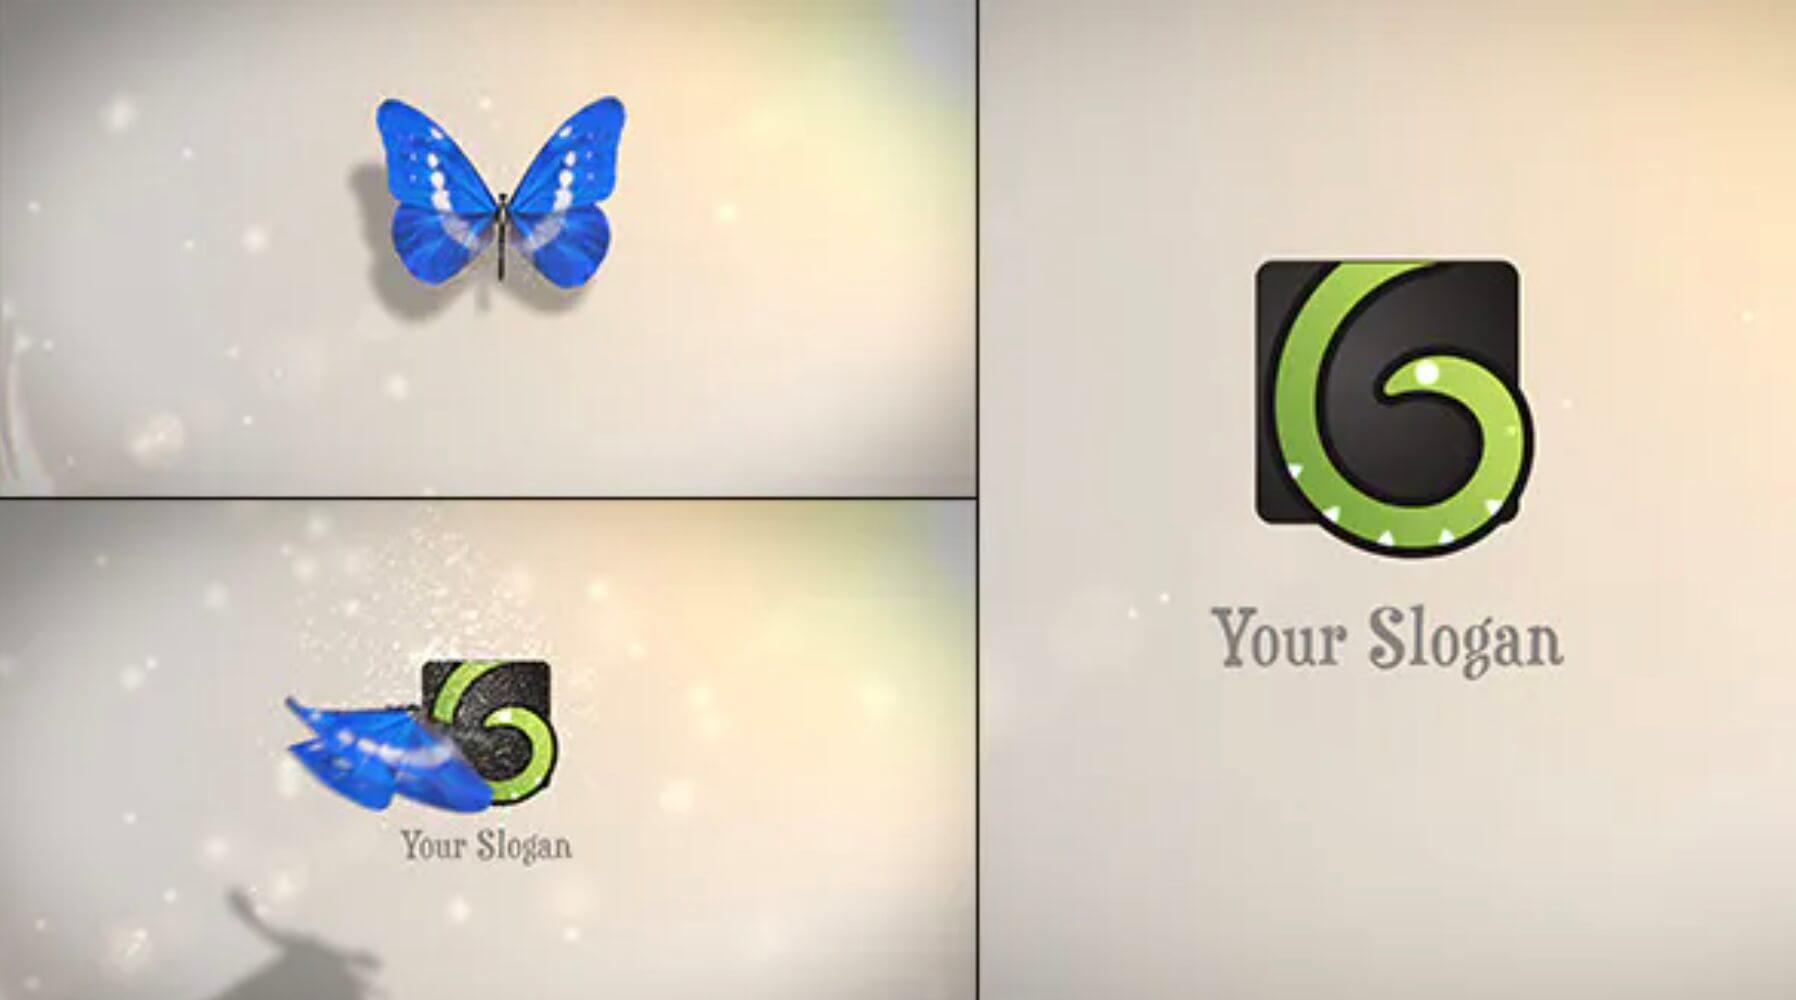 AE模板-蝴蝶logo插图